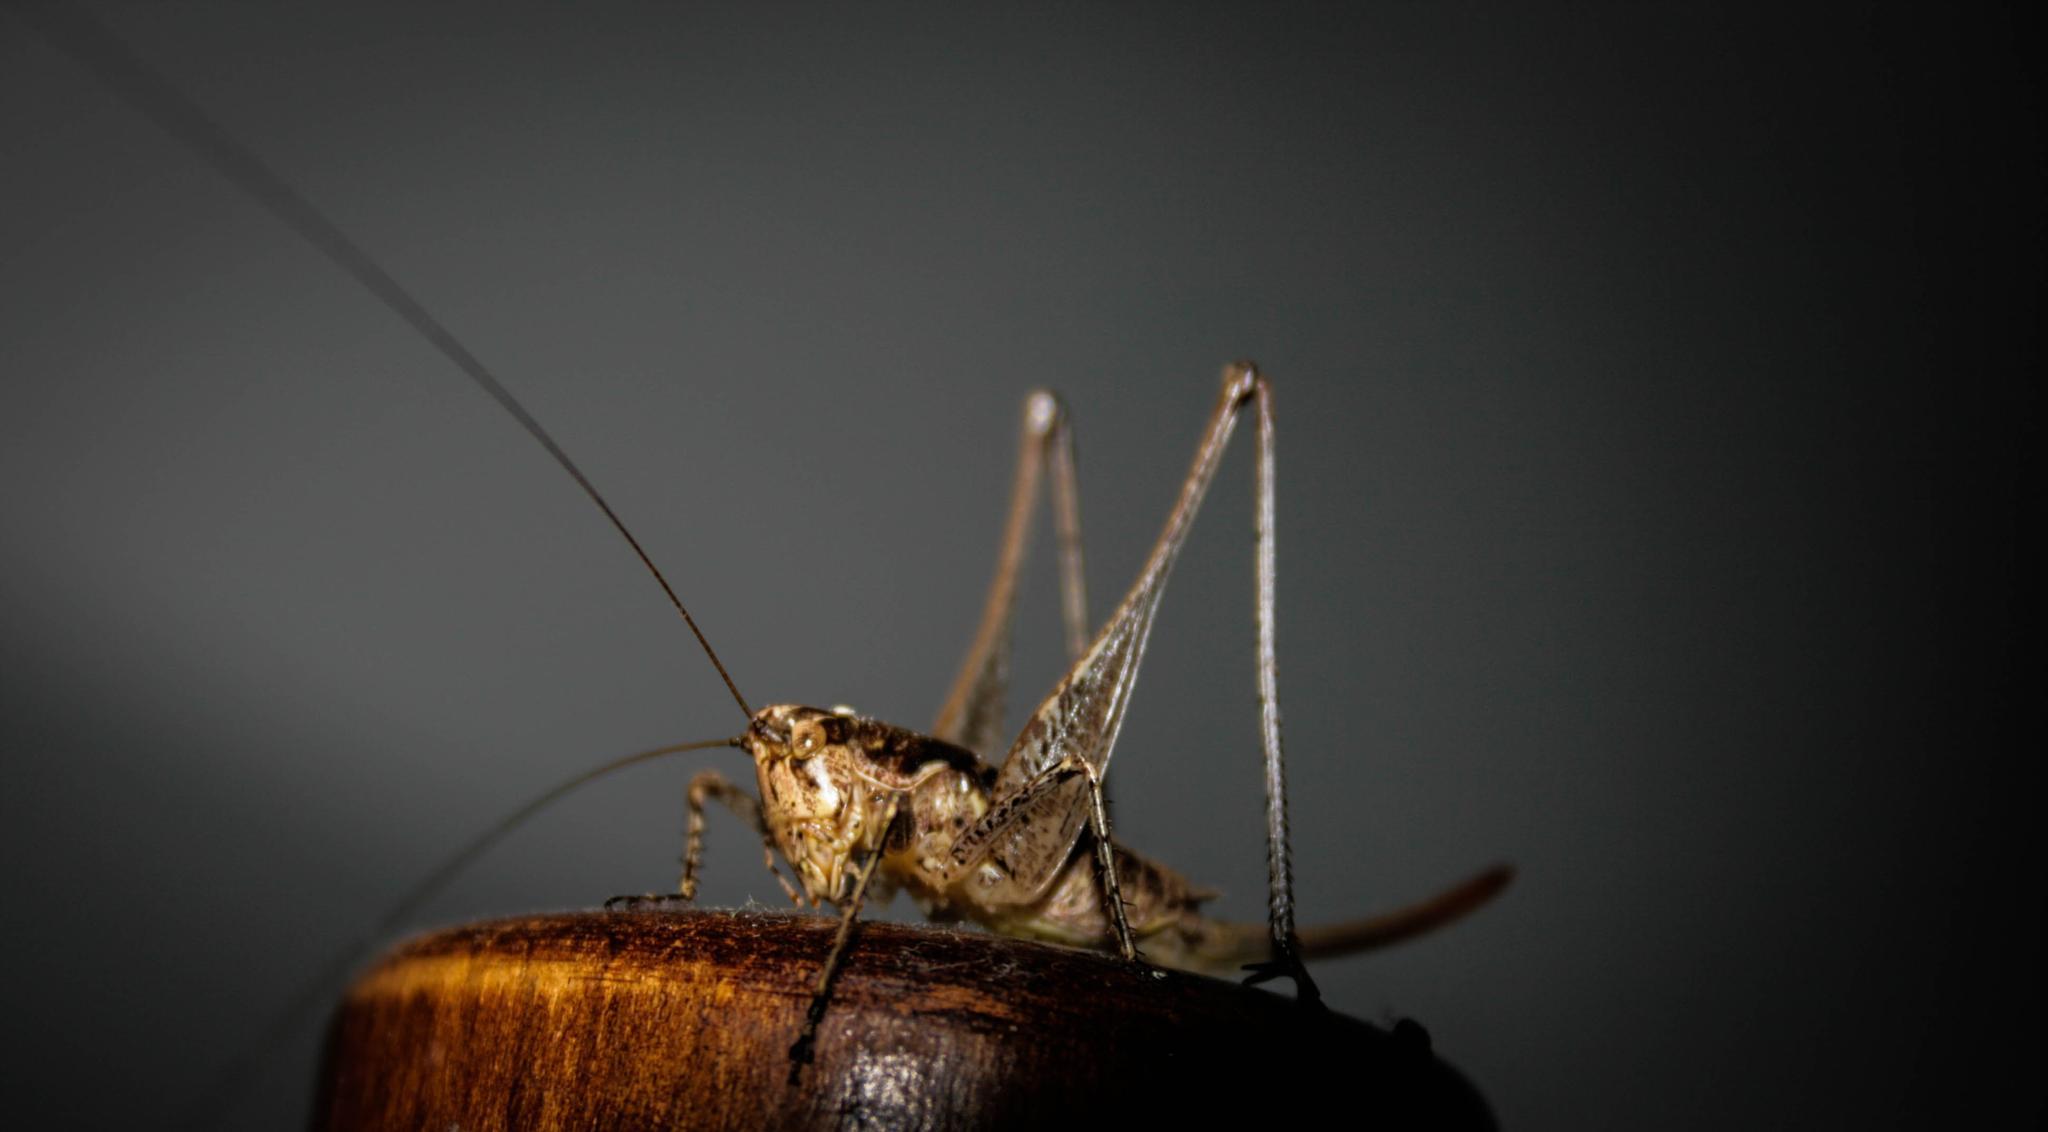 Cricket by Atanas Lenkov